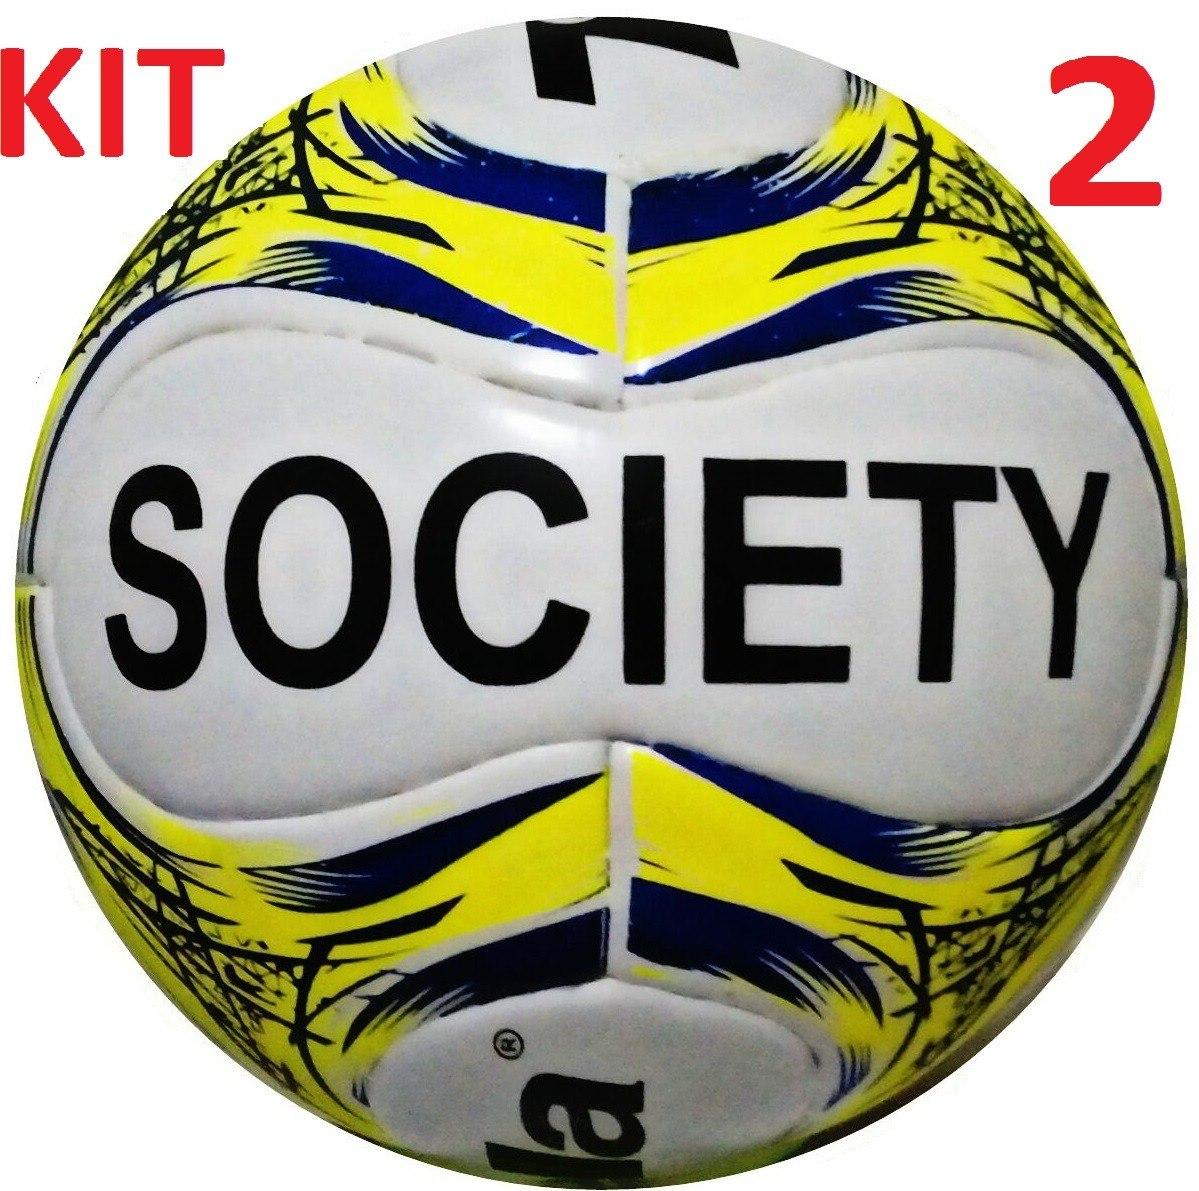 Kit 2 Bolas De Society Trivella Original - Brasil Gold - R  116 341fb680fc37e